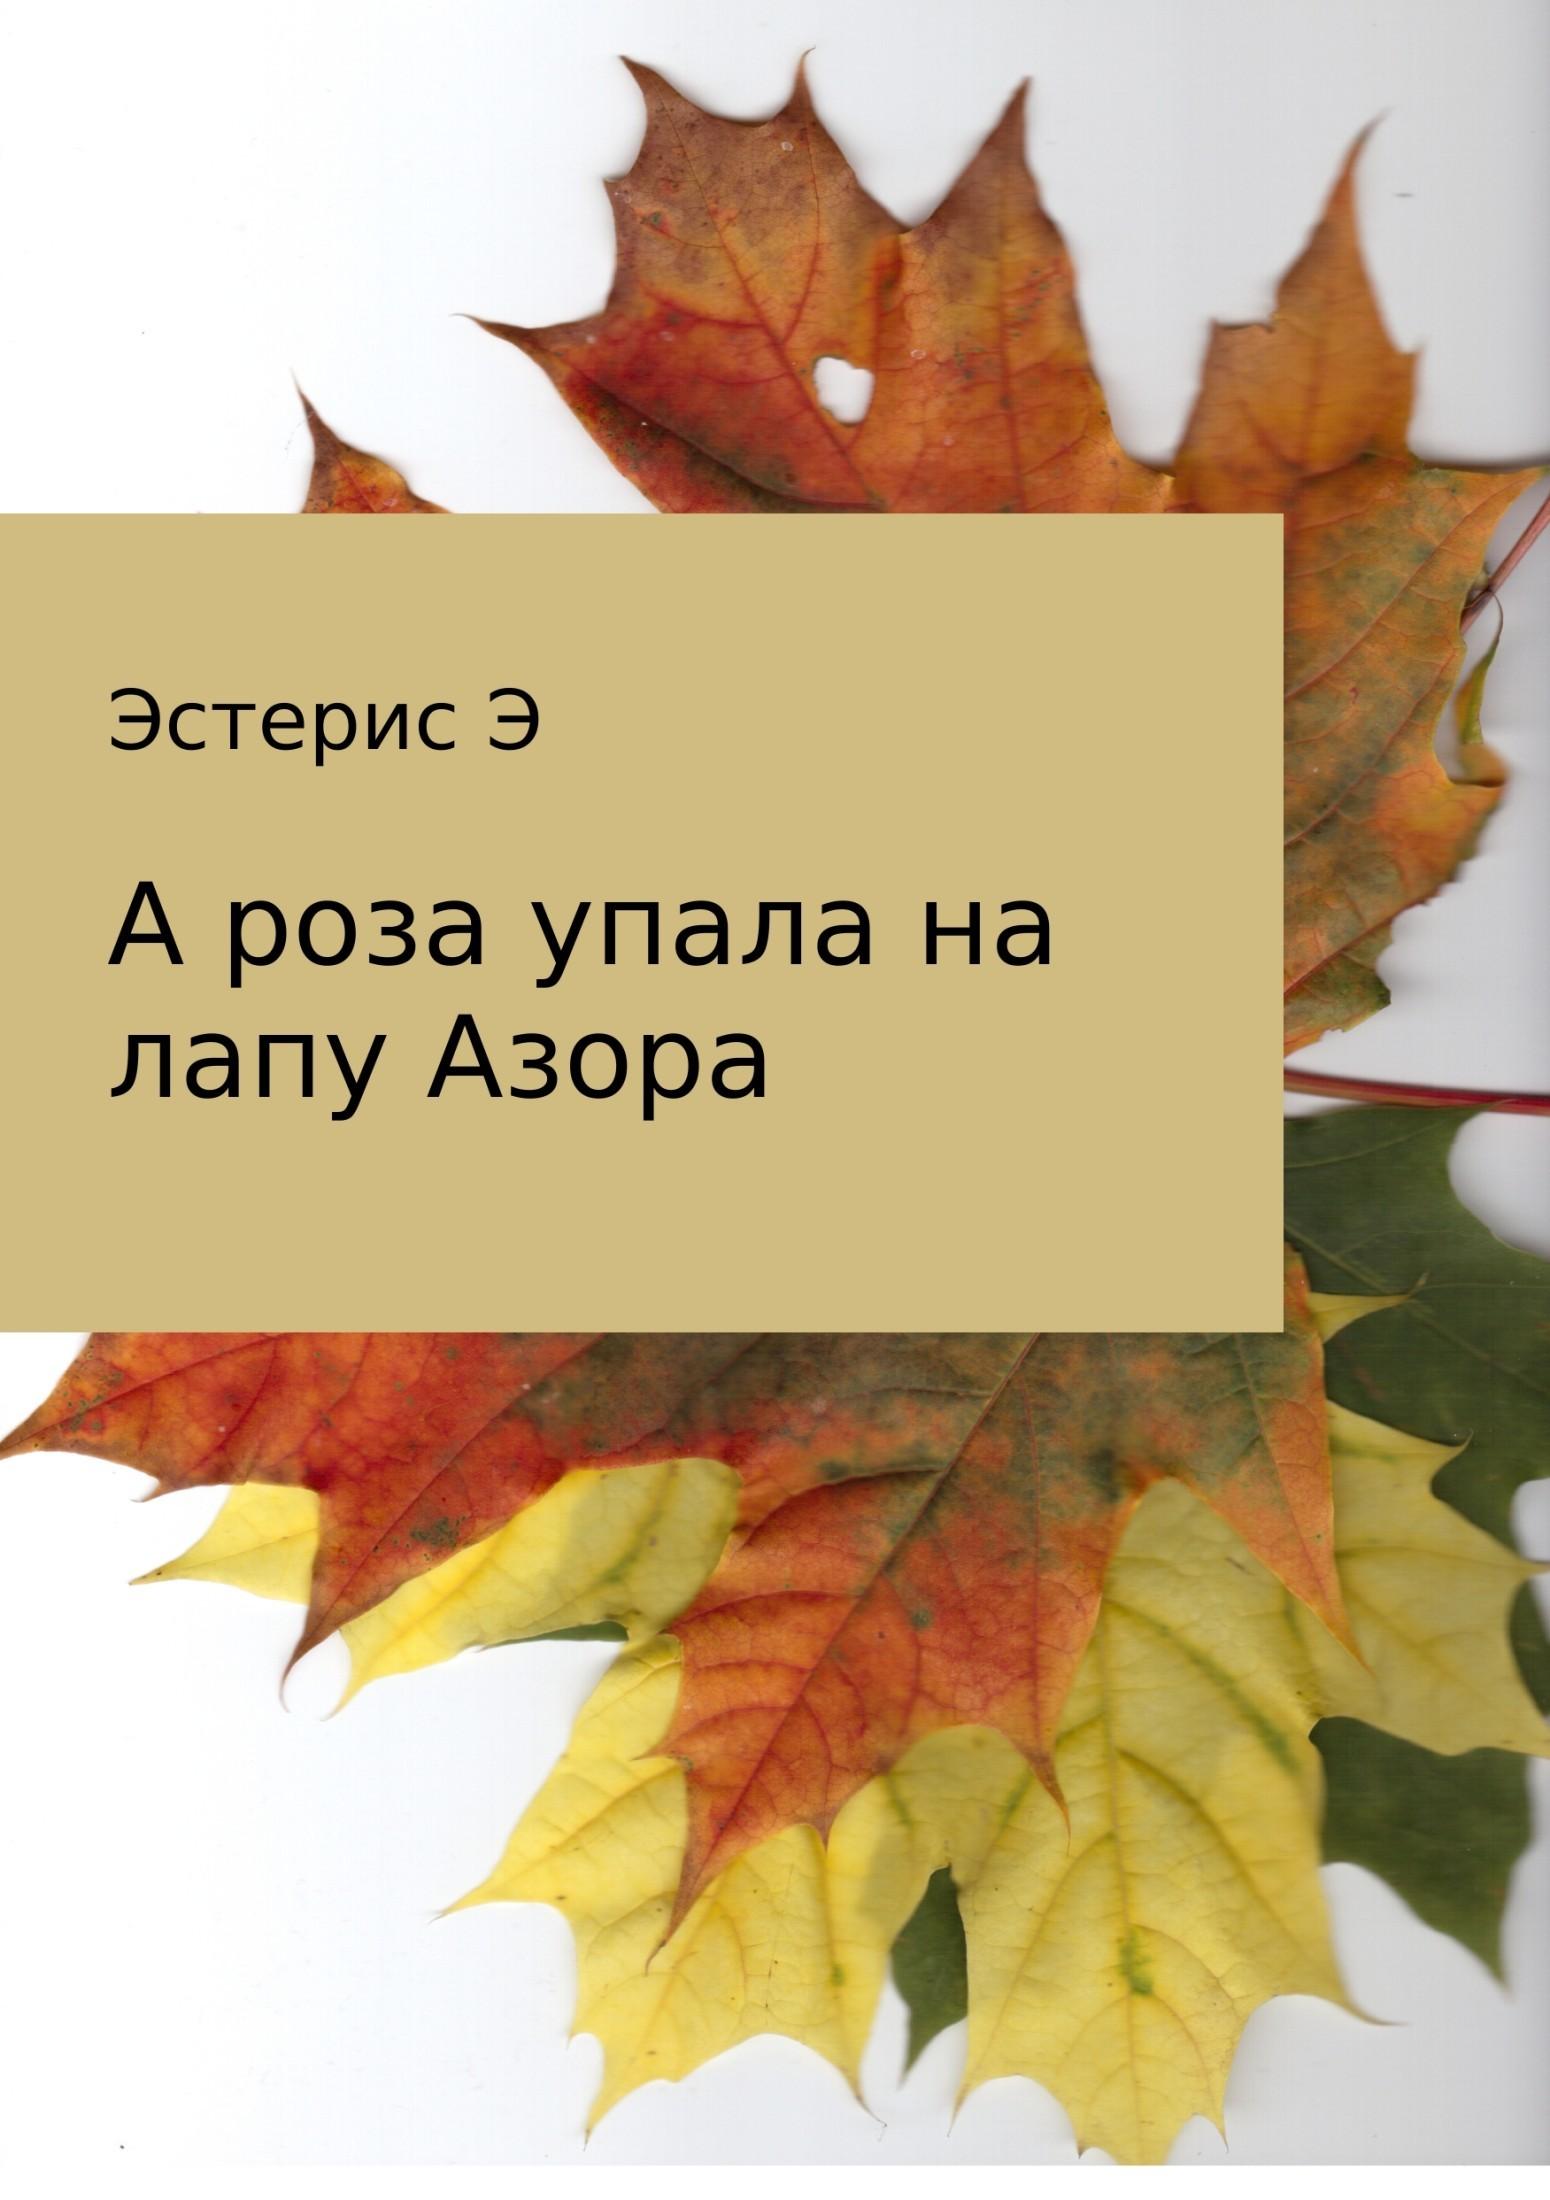 Эдуард Эстерис А роза упала на лапу Азора